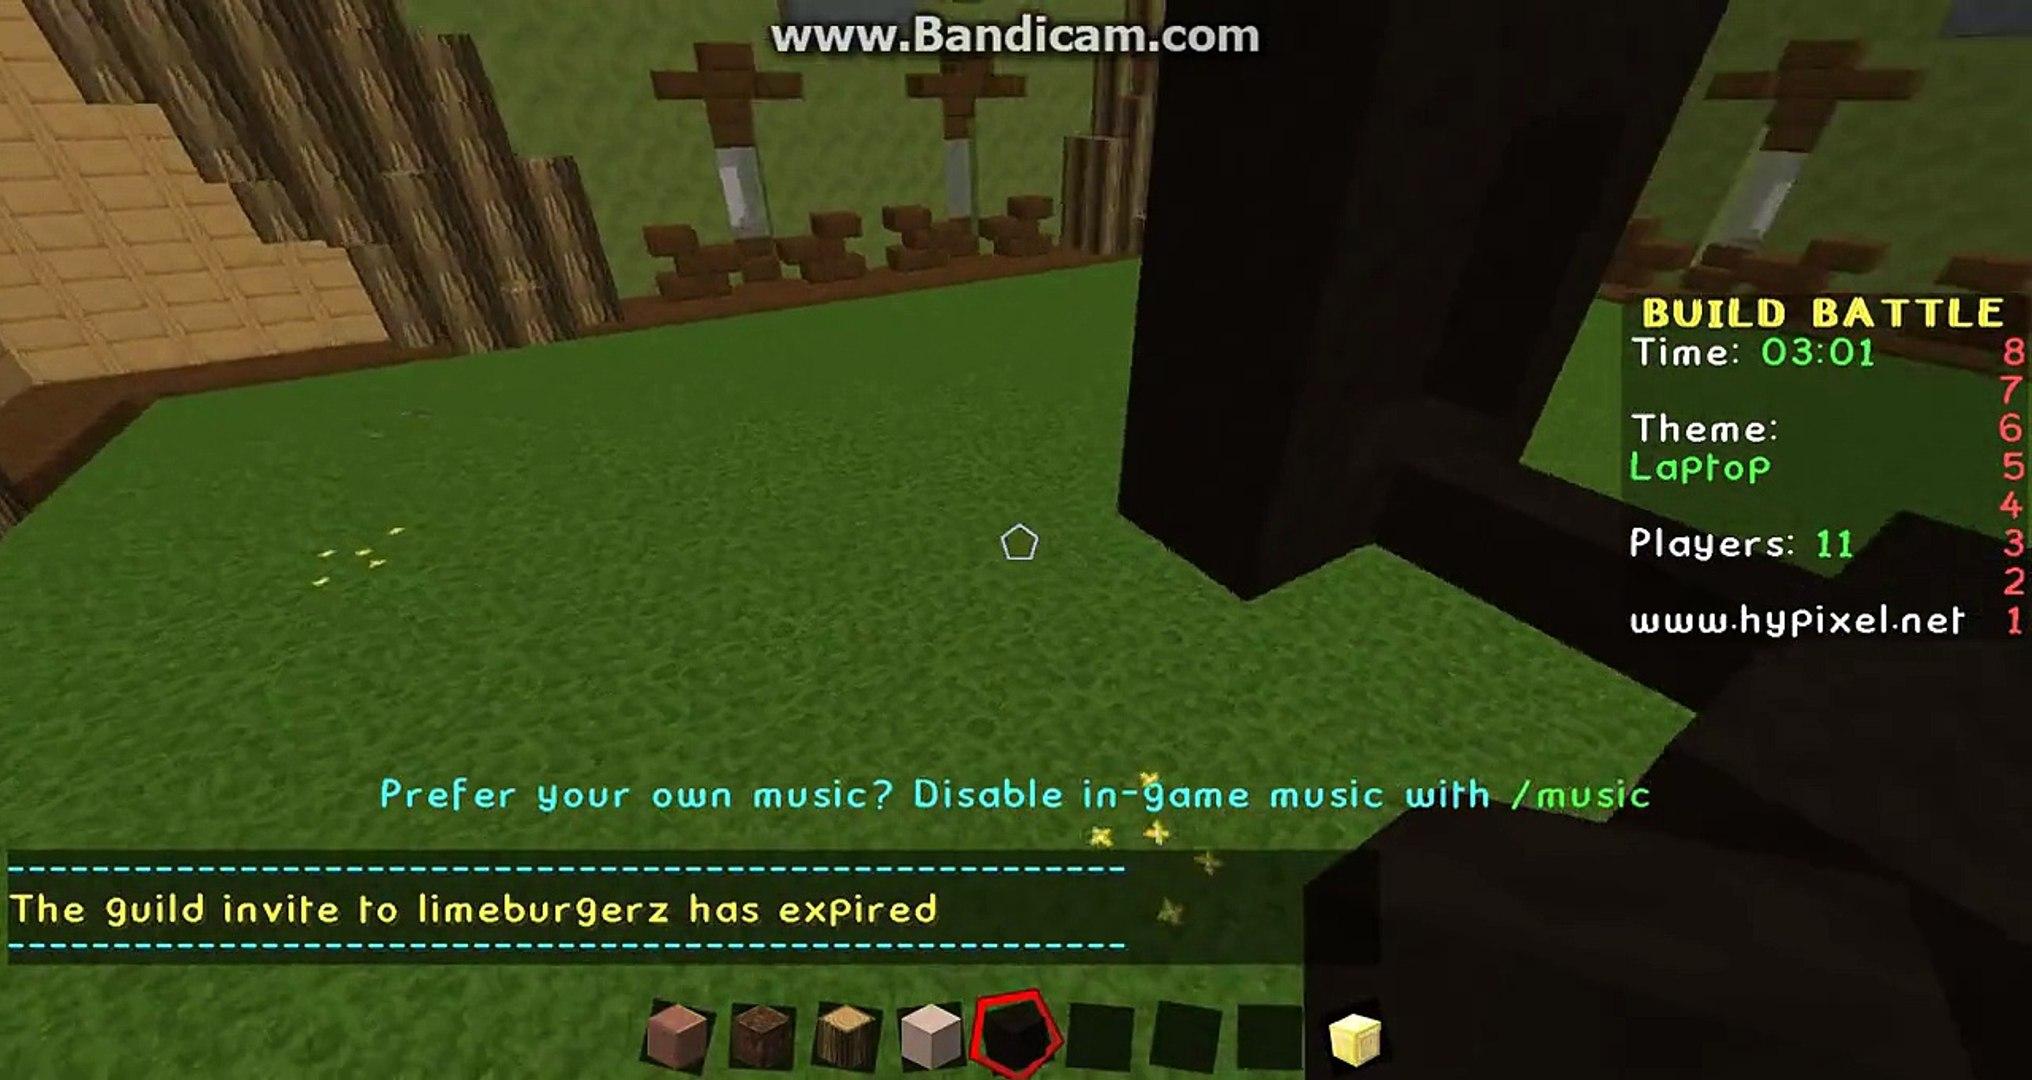 Minecraft - Build Battle - Laptop